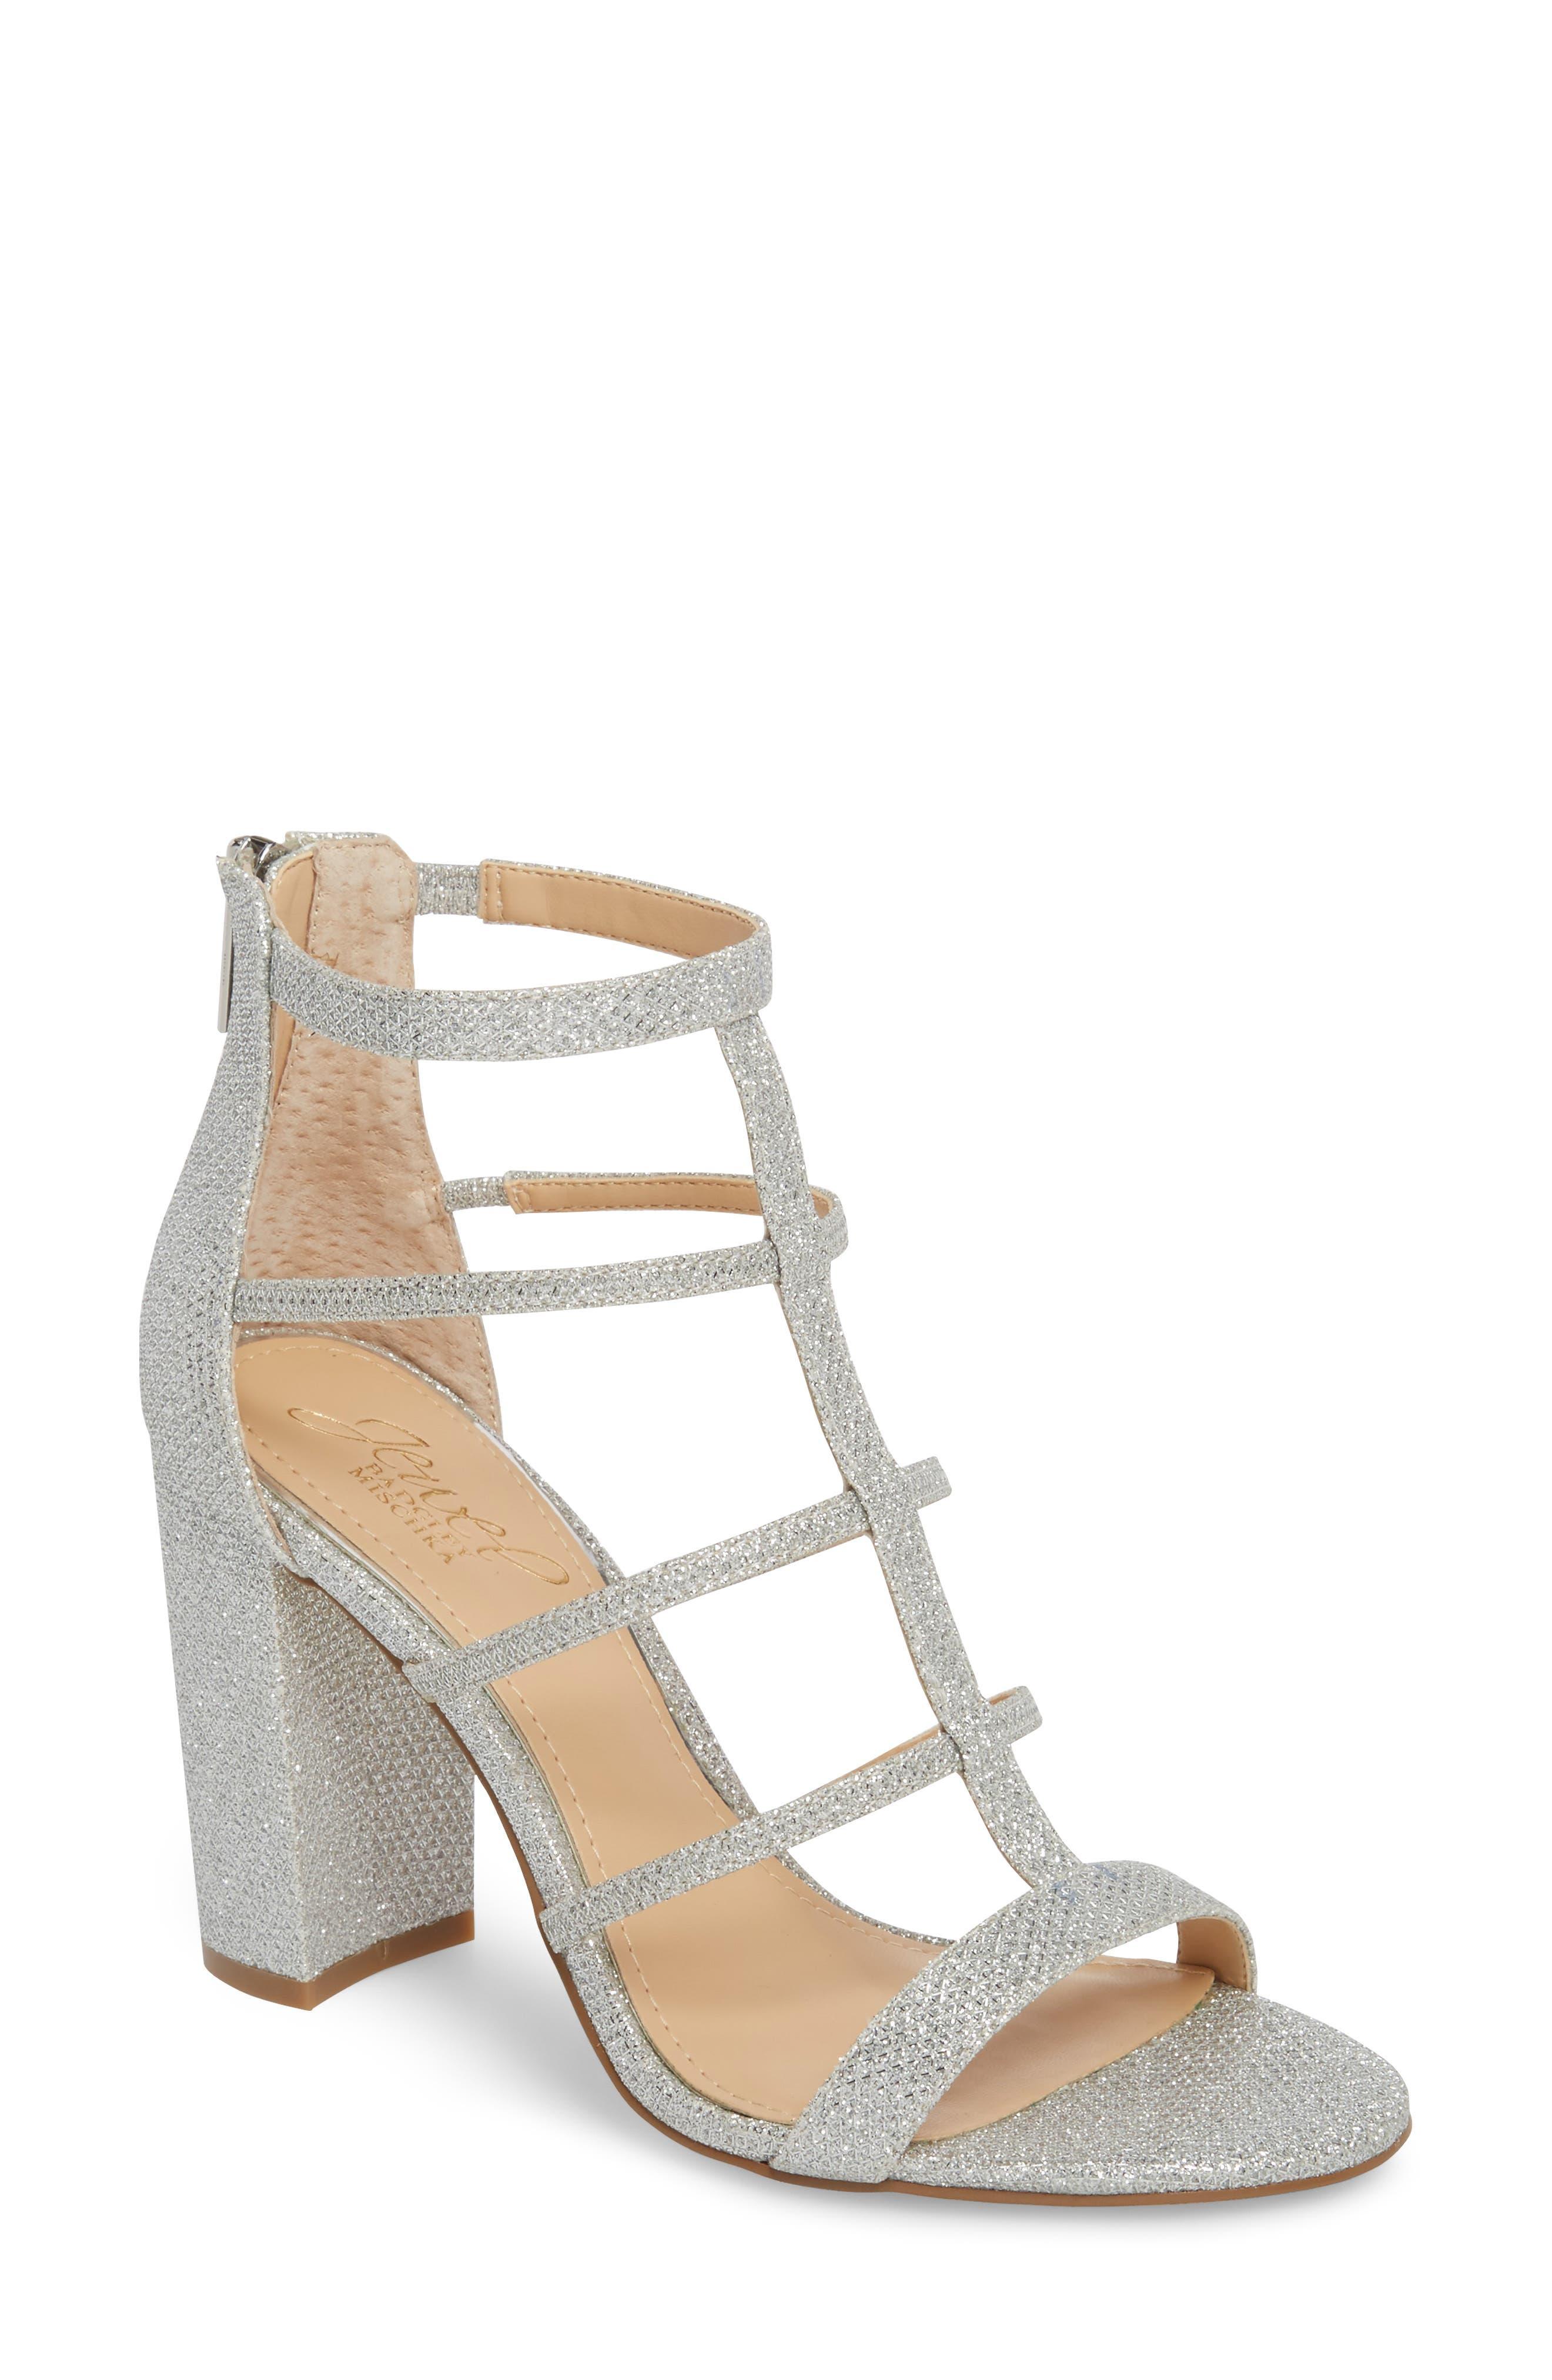 Jewel Badgley Mischka Teddy Glitter Sandal (Women)